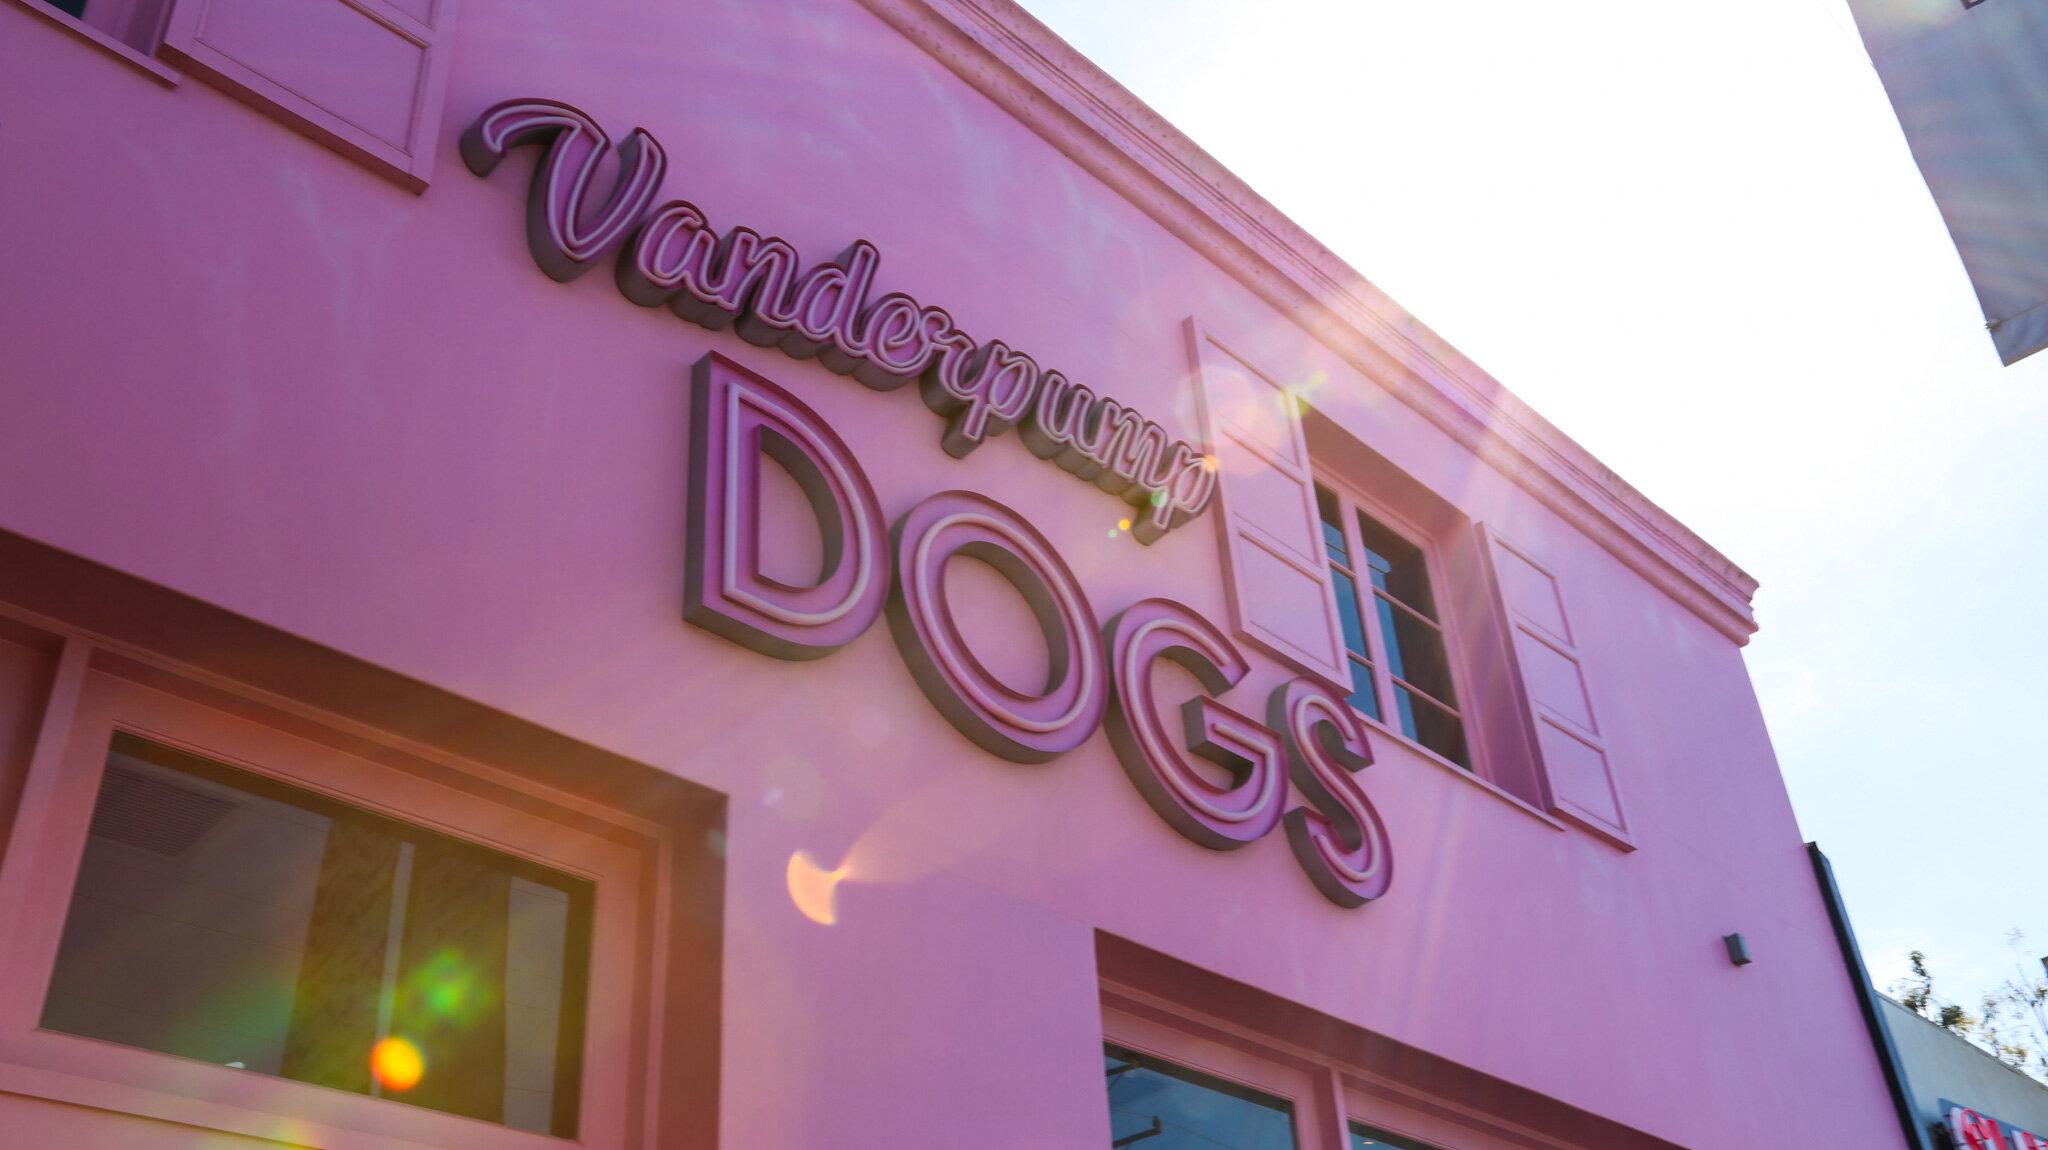 A photo of the Vanderpump Dog Foundation